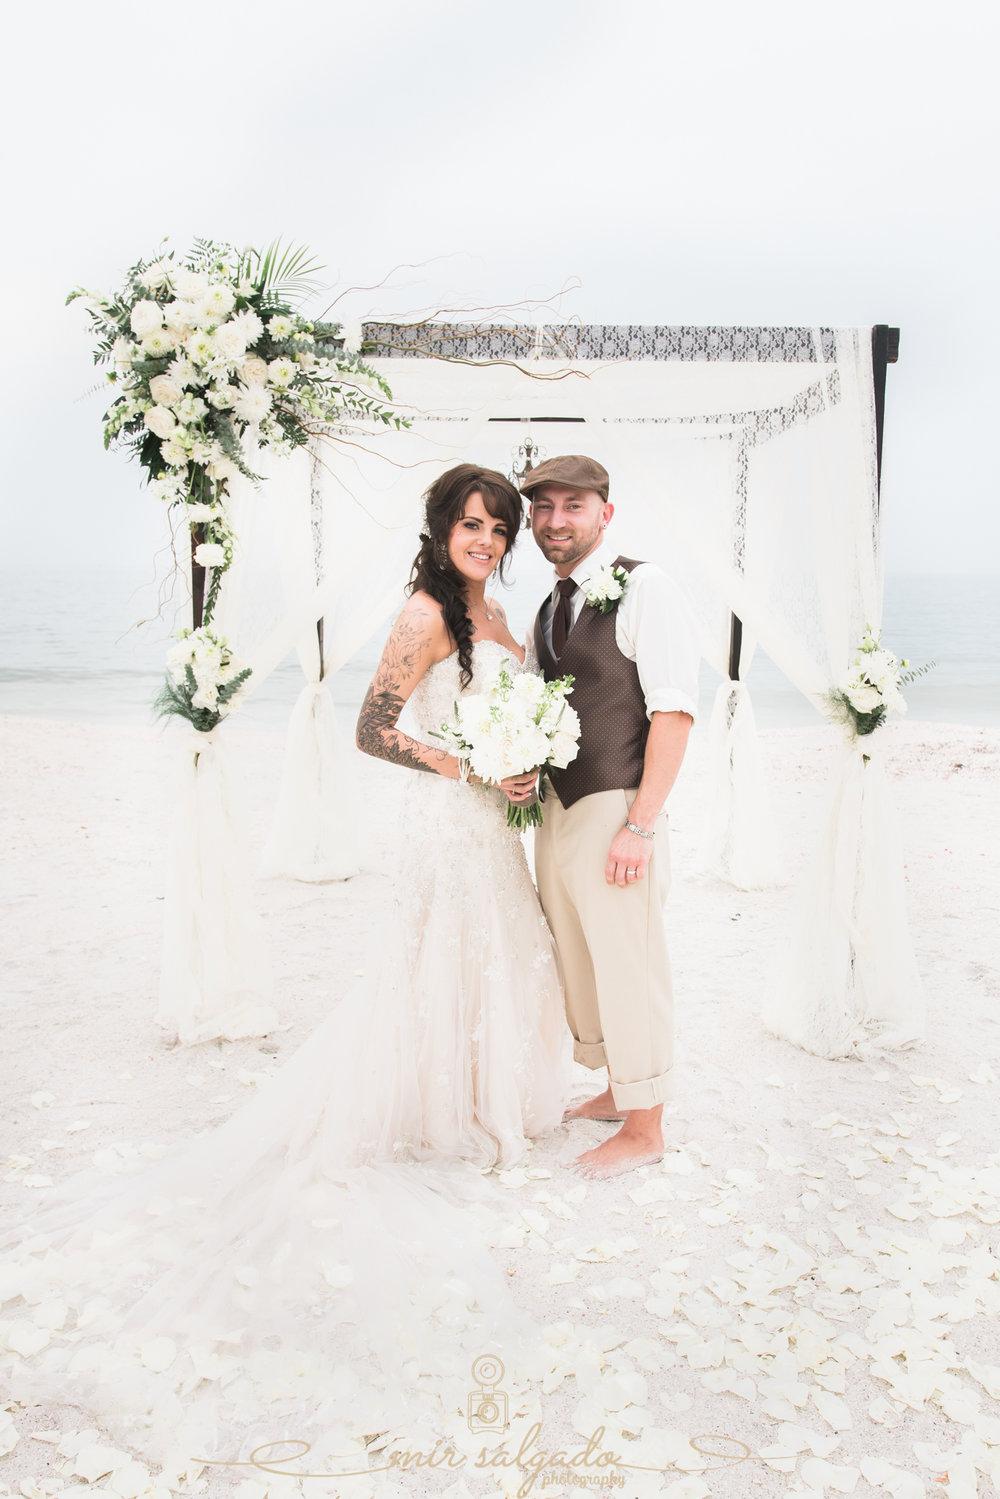 Tide-the-knot-beach-weddings, beach-wedding-photo, bride-and-groom